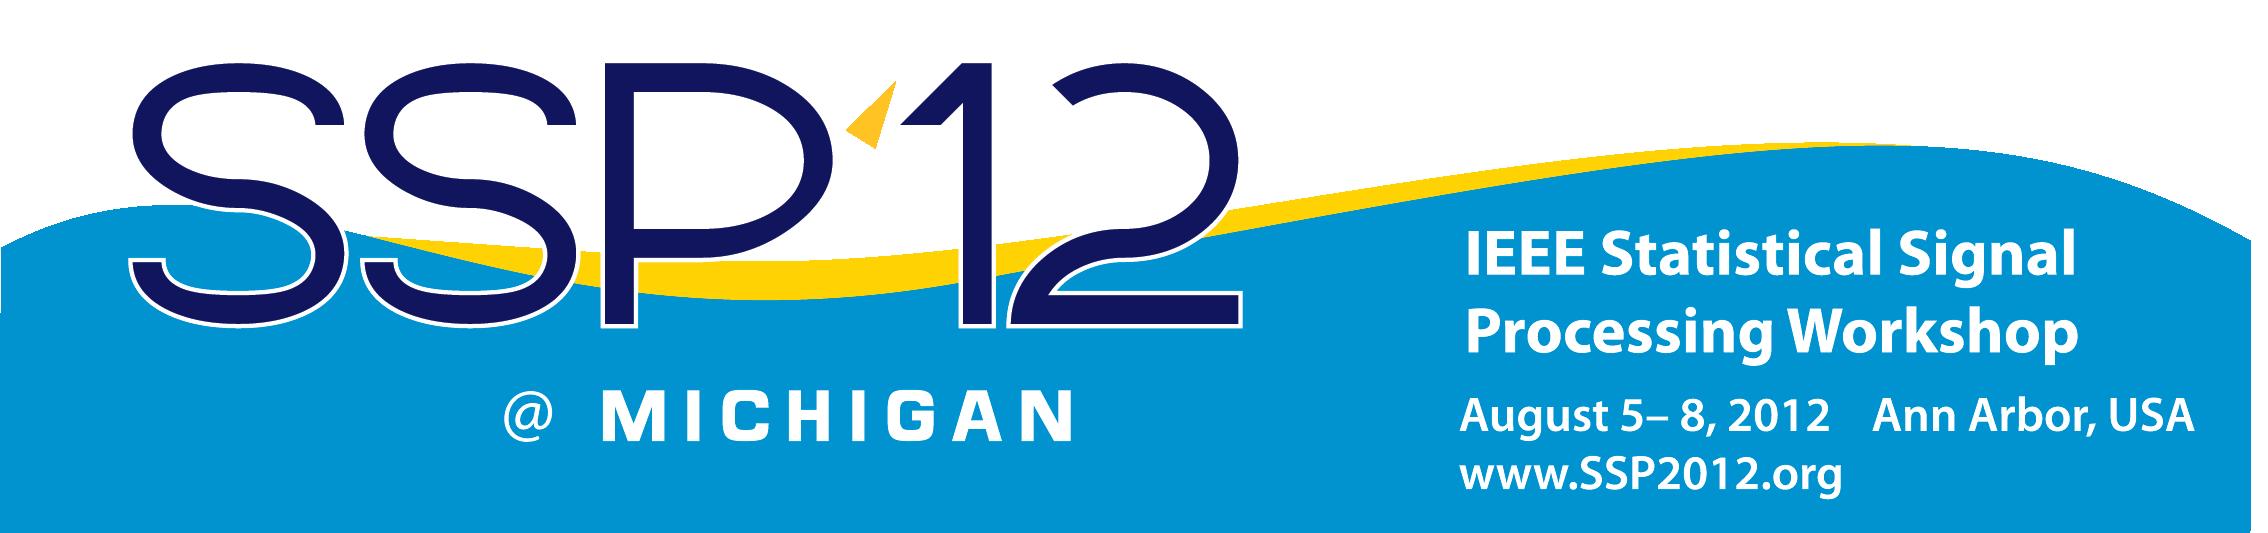 SSP'12